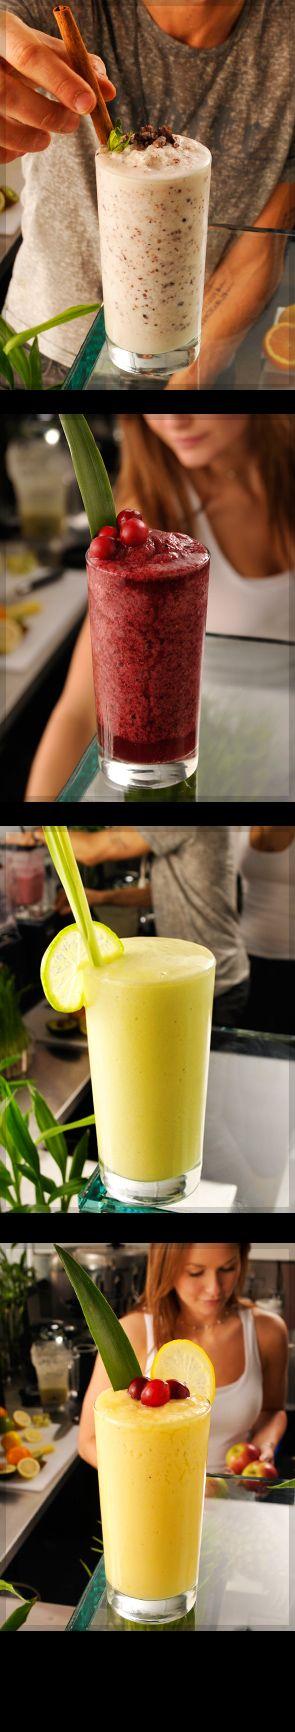 Blends | Thrive Juice Bar